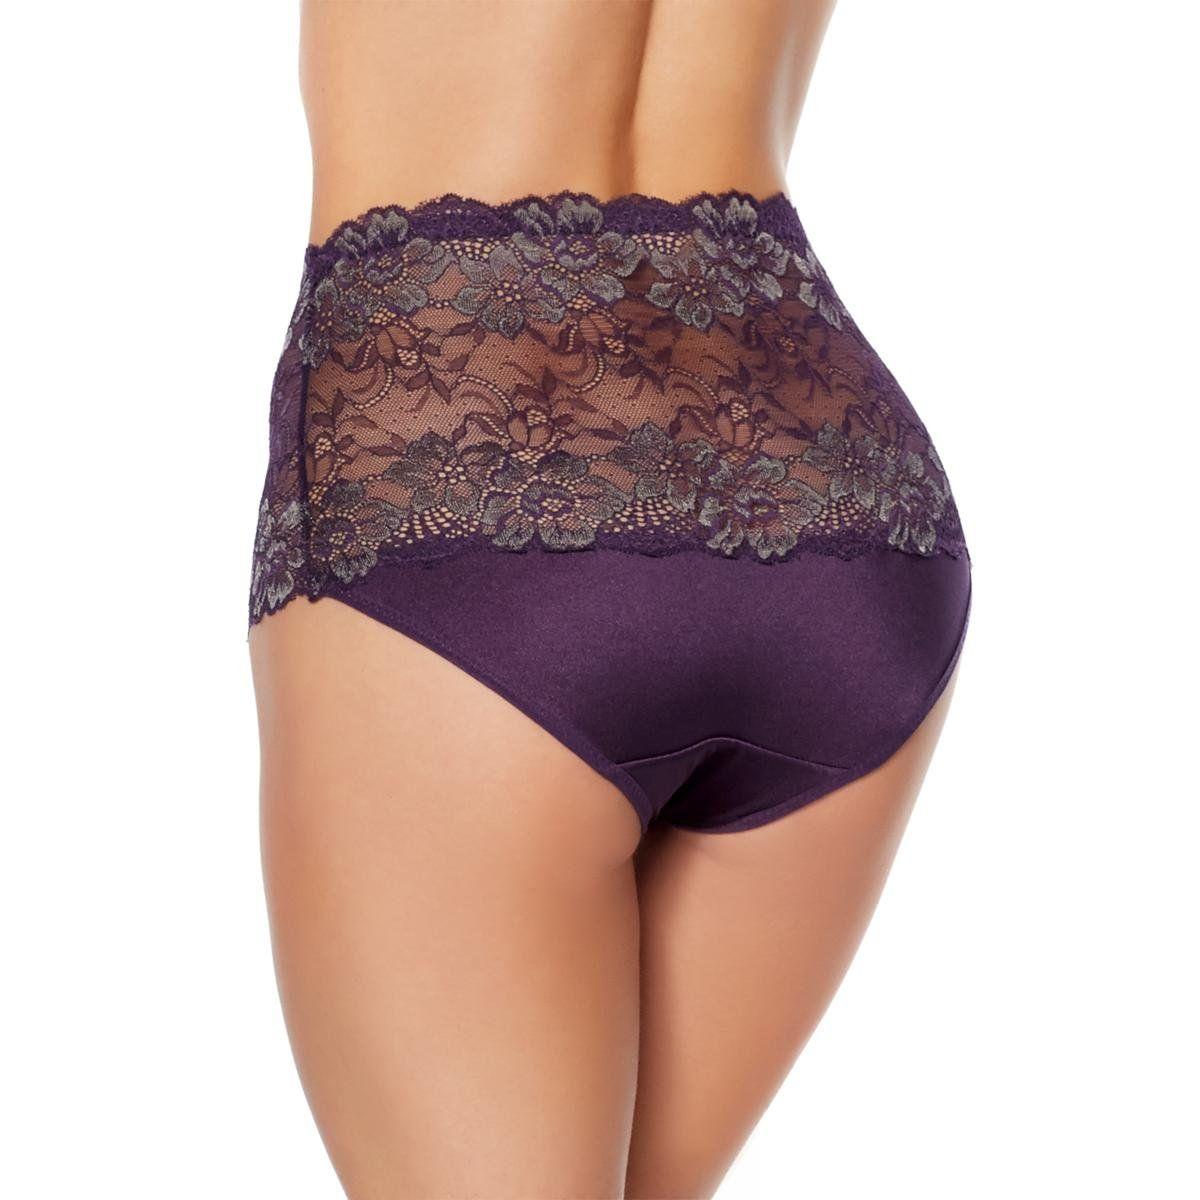 Lace Overlay Panties Scenes